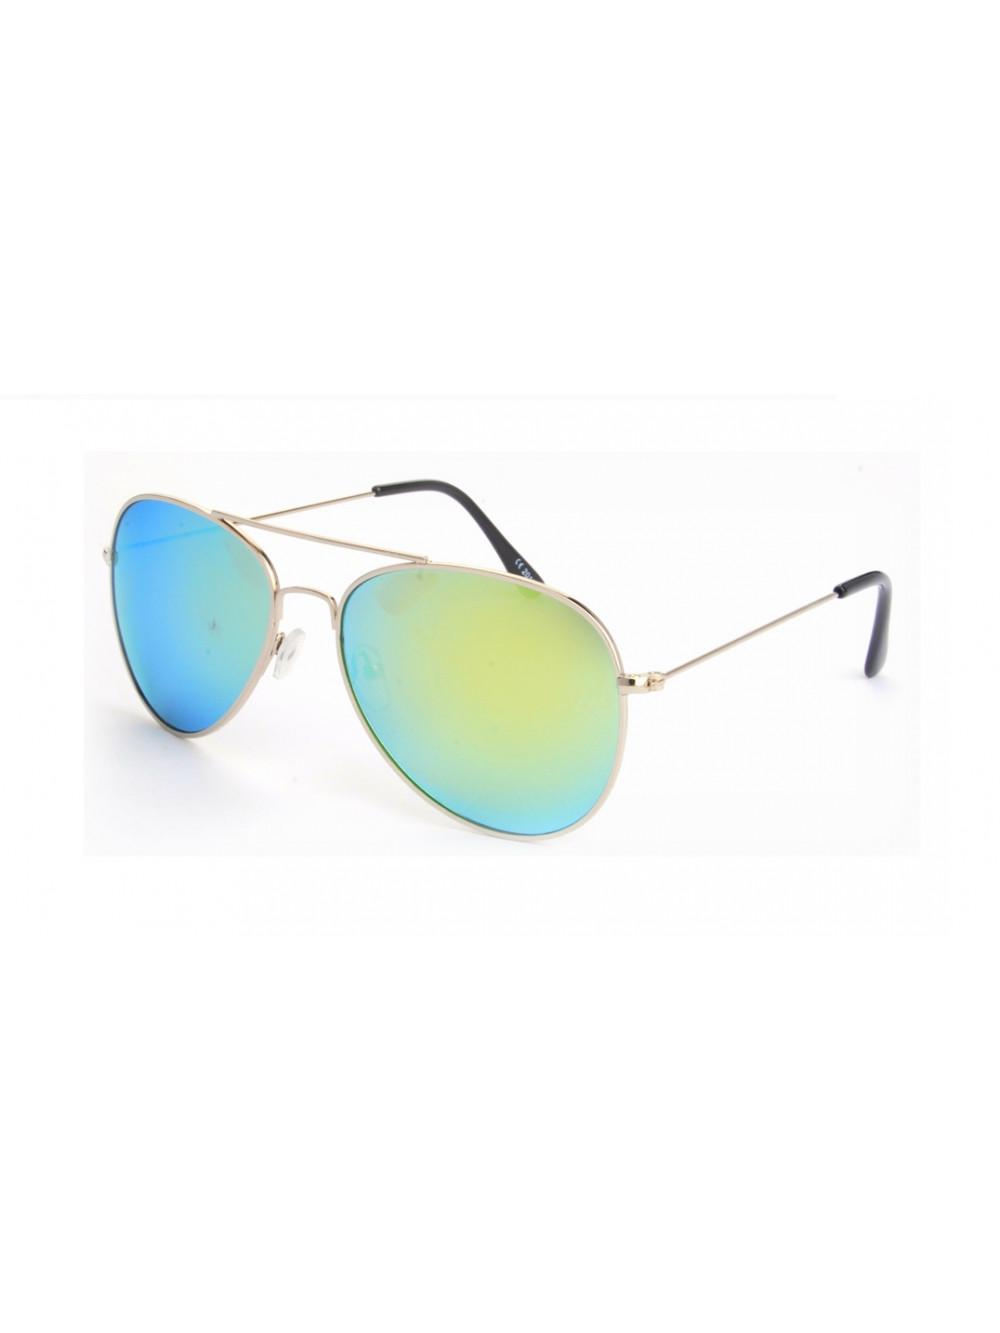 Slnečné okuliare Aviator Pilot Green